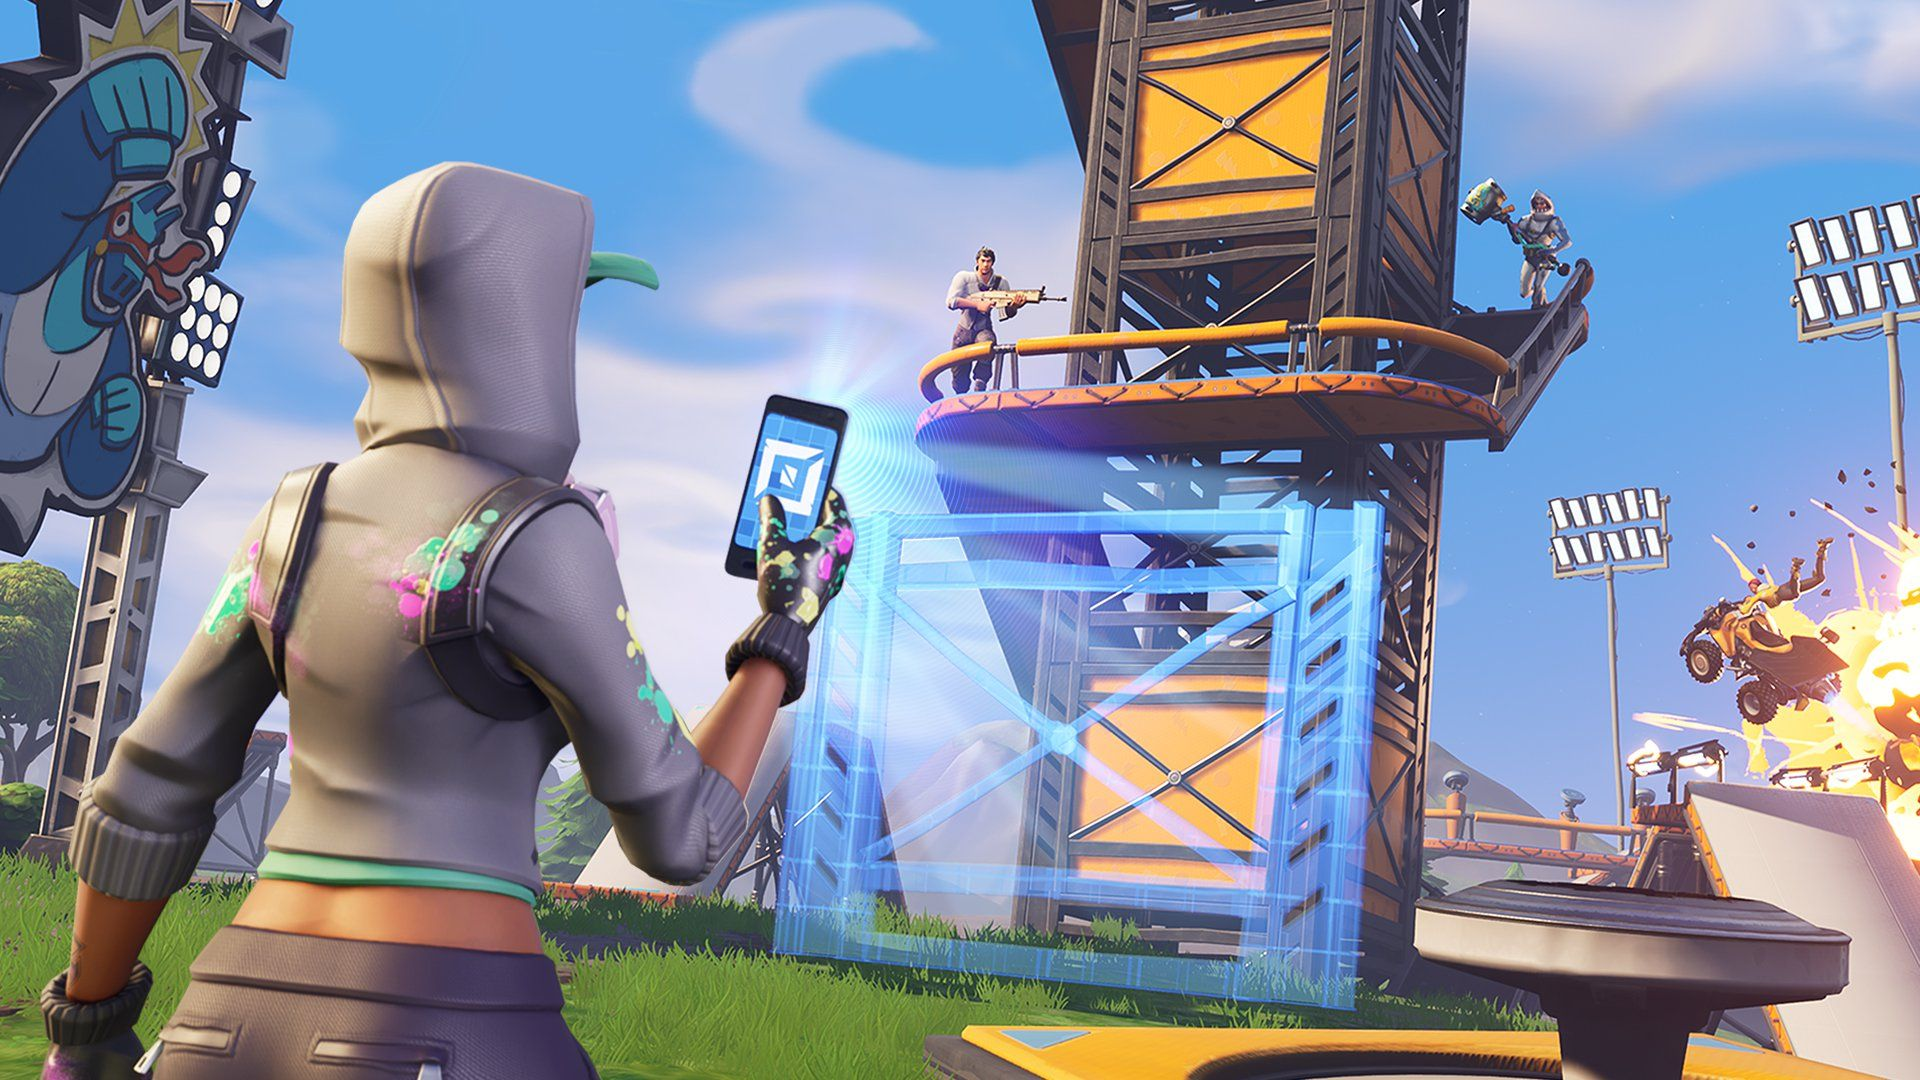 Make Your Own Fortnite Island With Fortnite Creative Fortnite Epic Games Epic